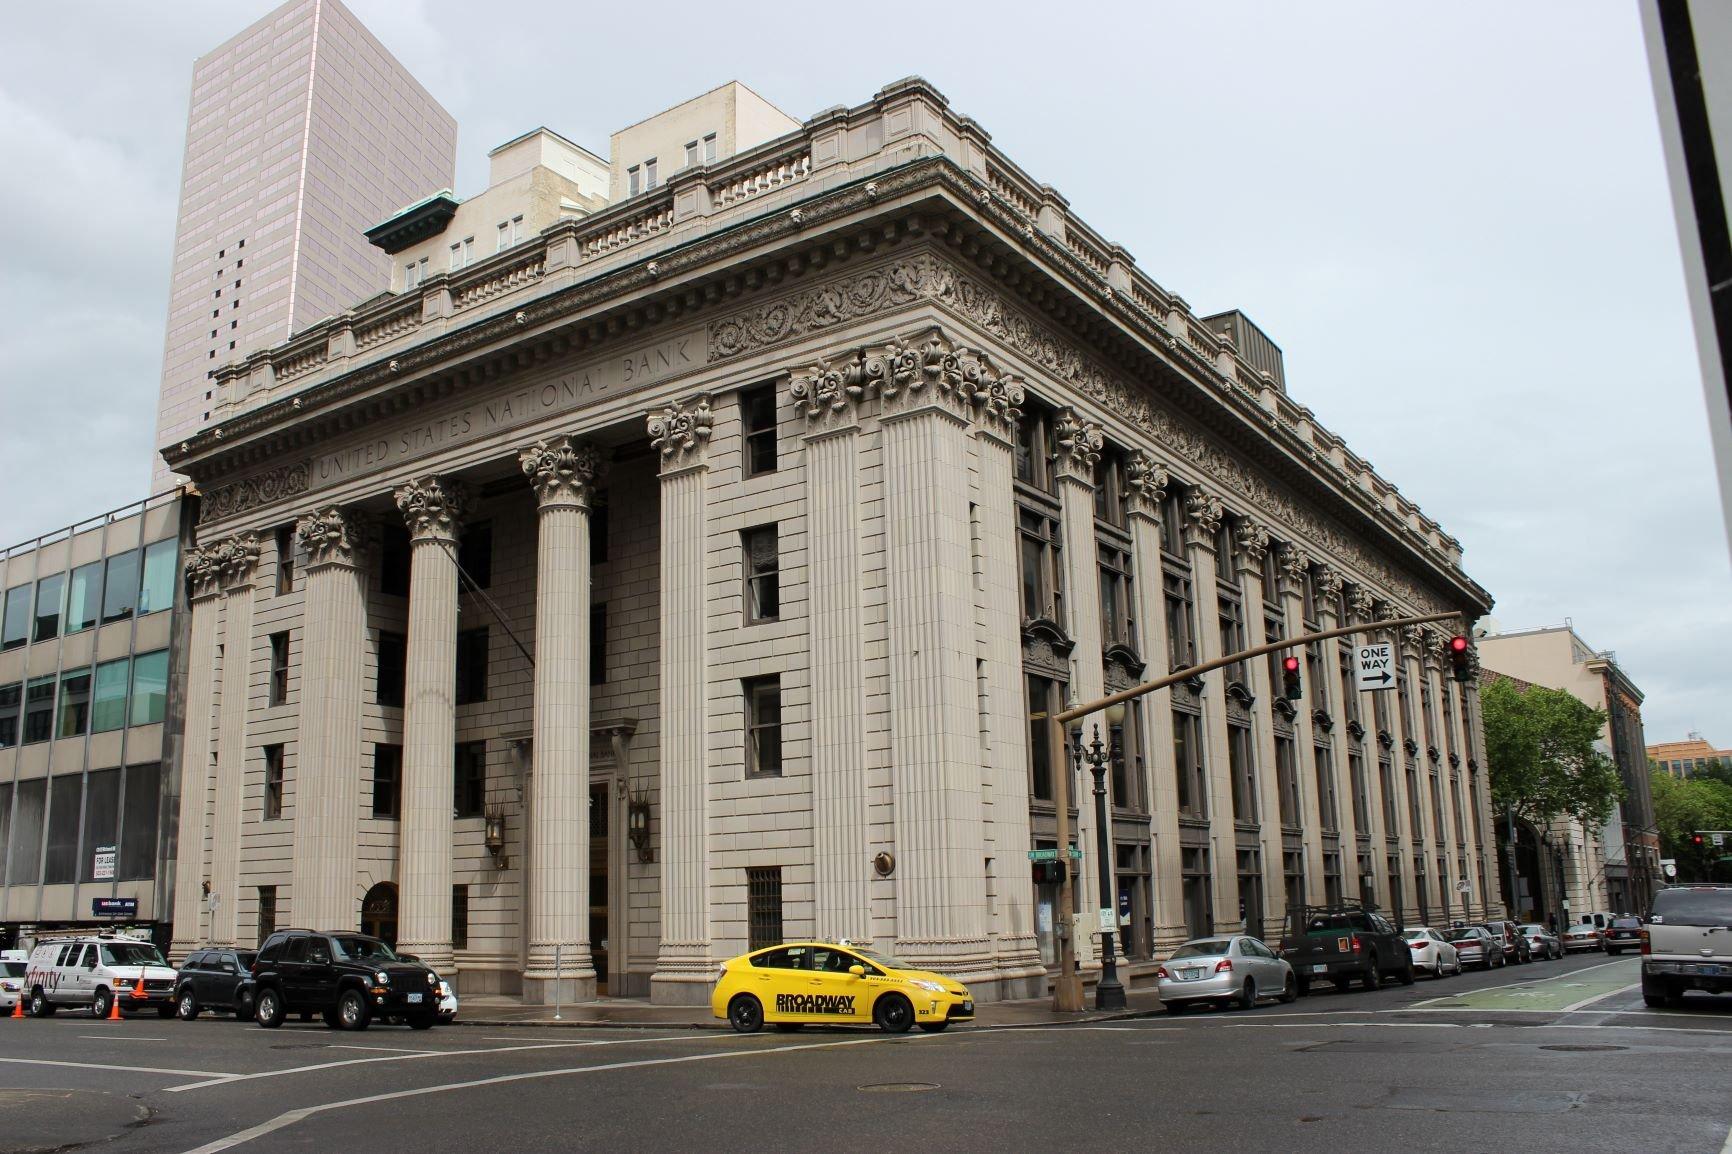 U.S. National Bank. Photo by Cynthia Prescott.